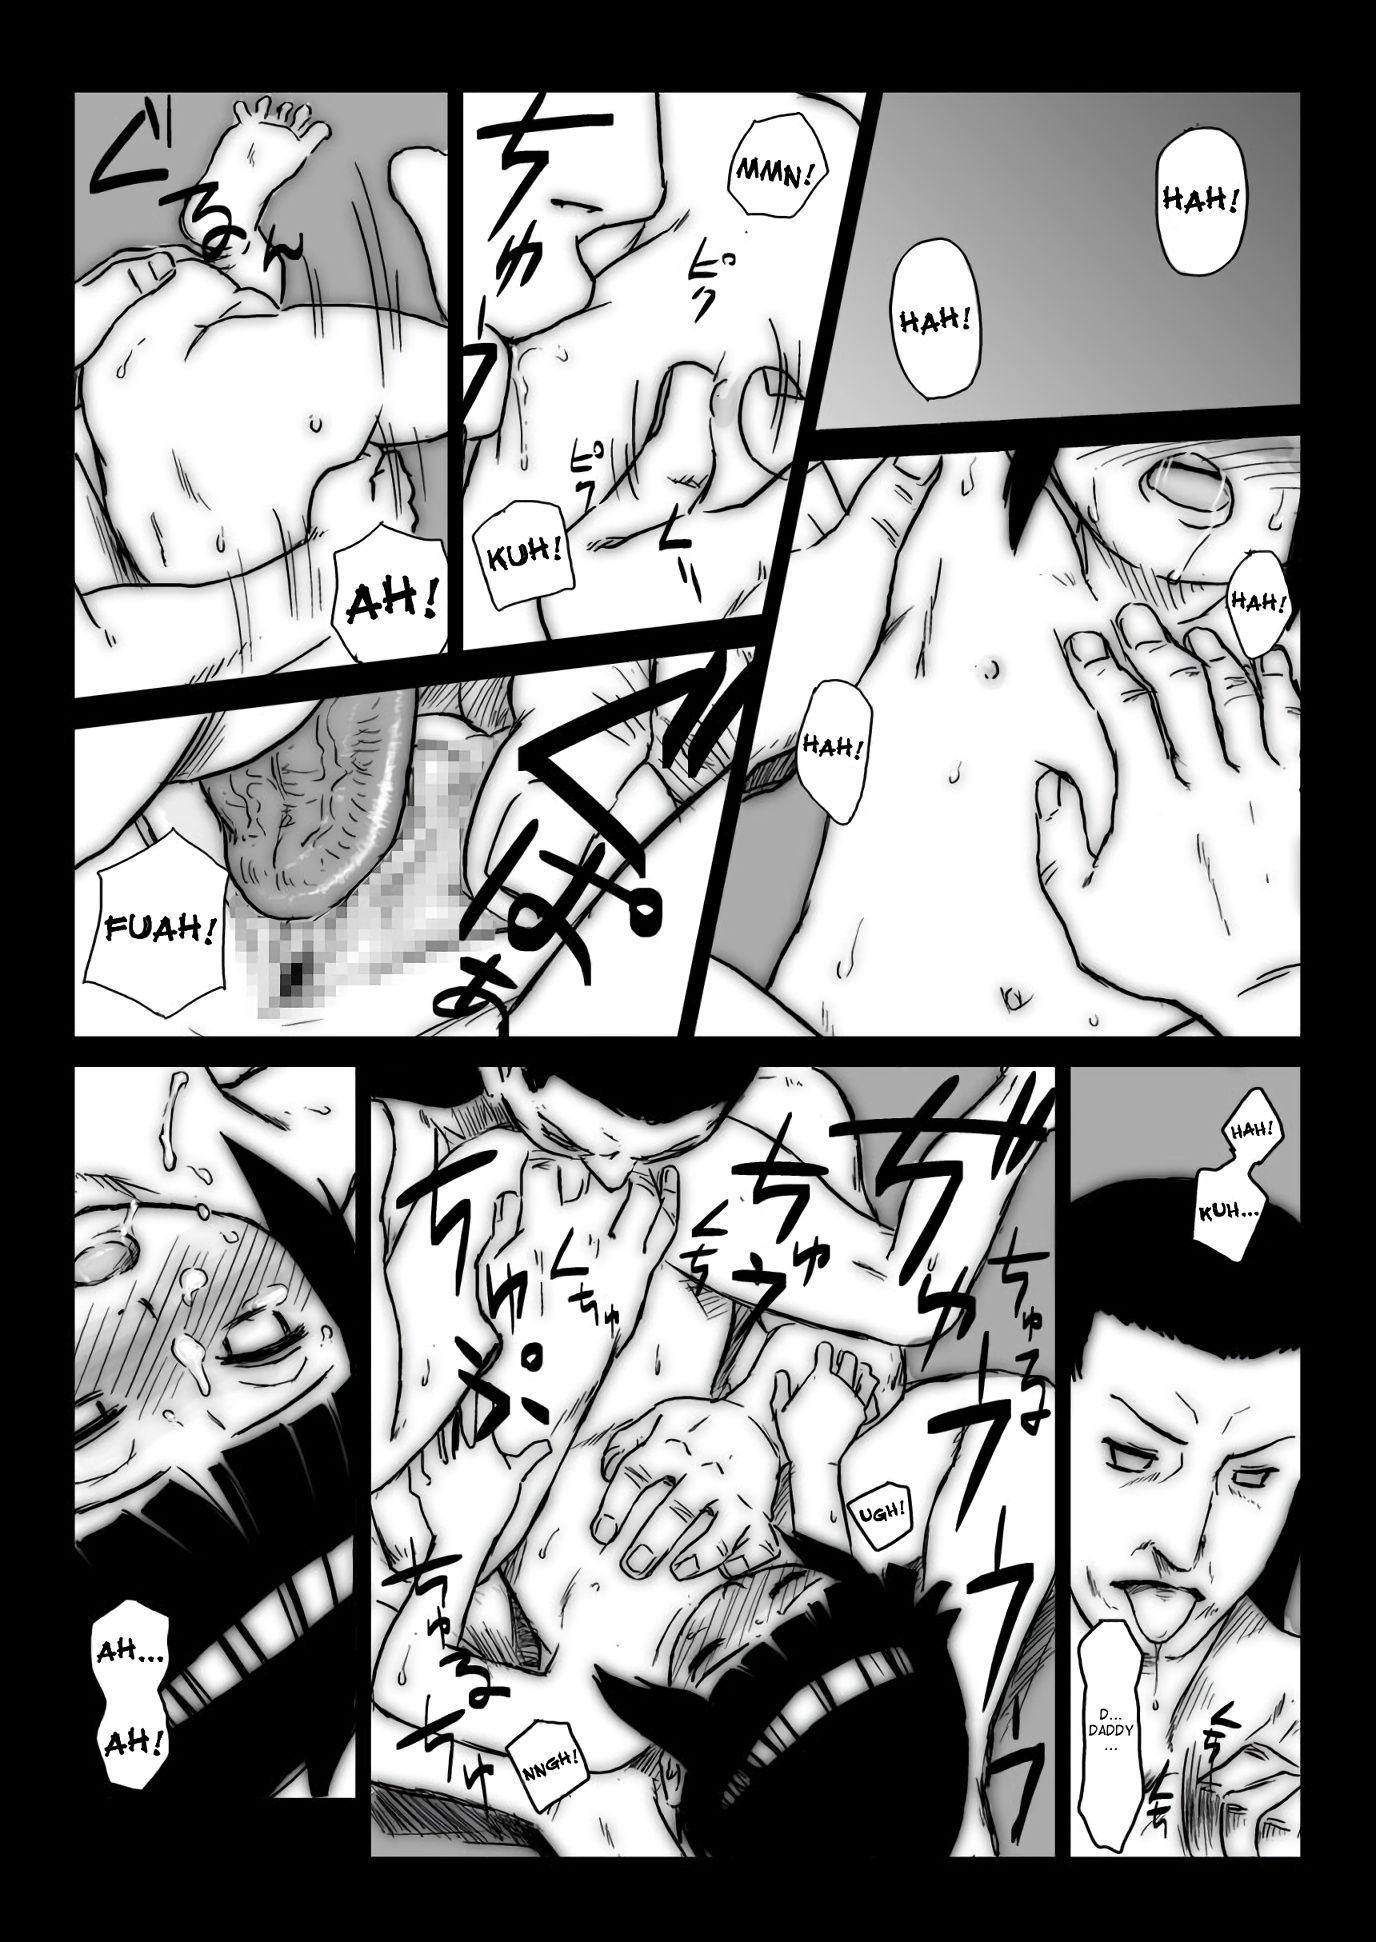 Ninja dependence vol. 3 hentai manga picture 7